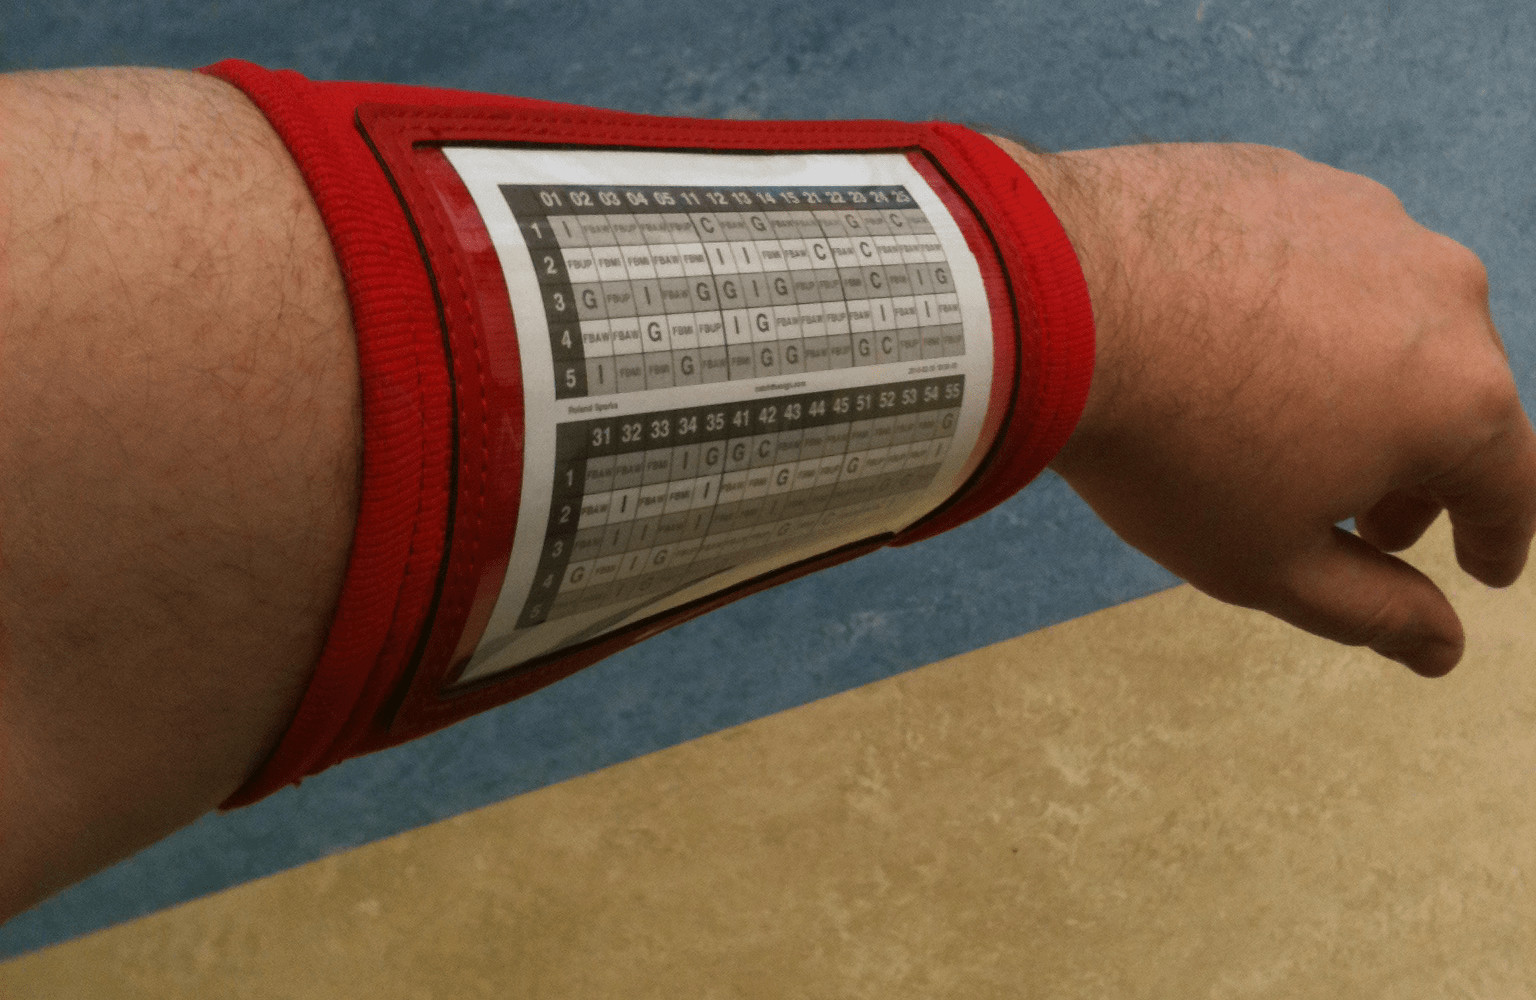 Nike Qb Wristband Template Football Play Wristbands